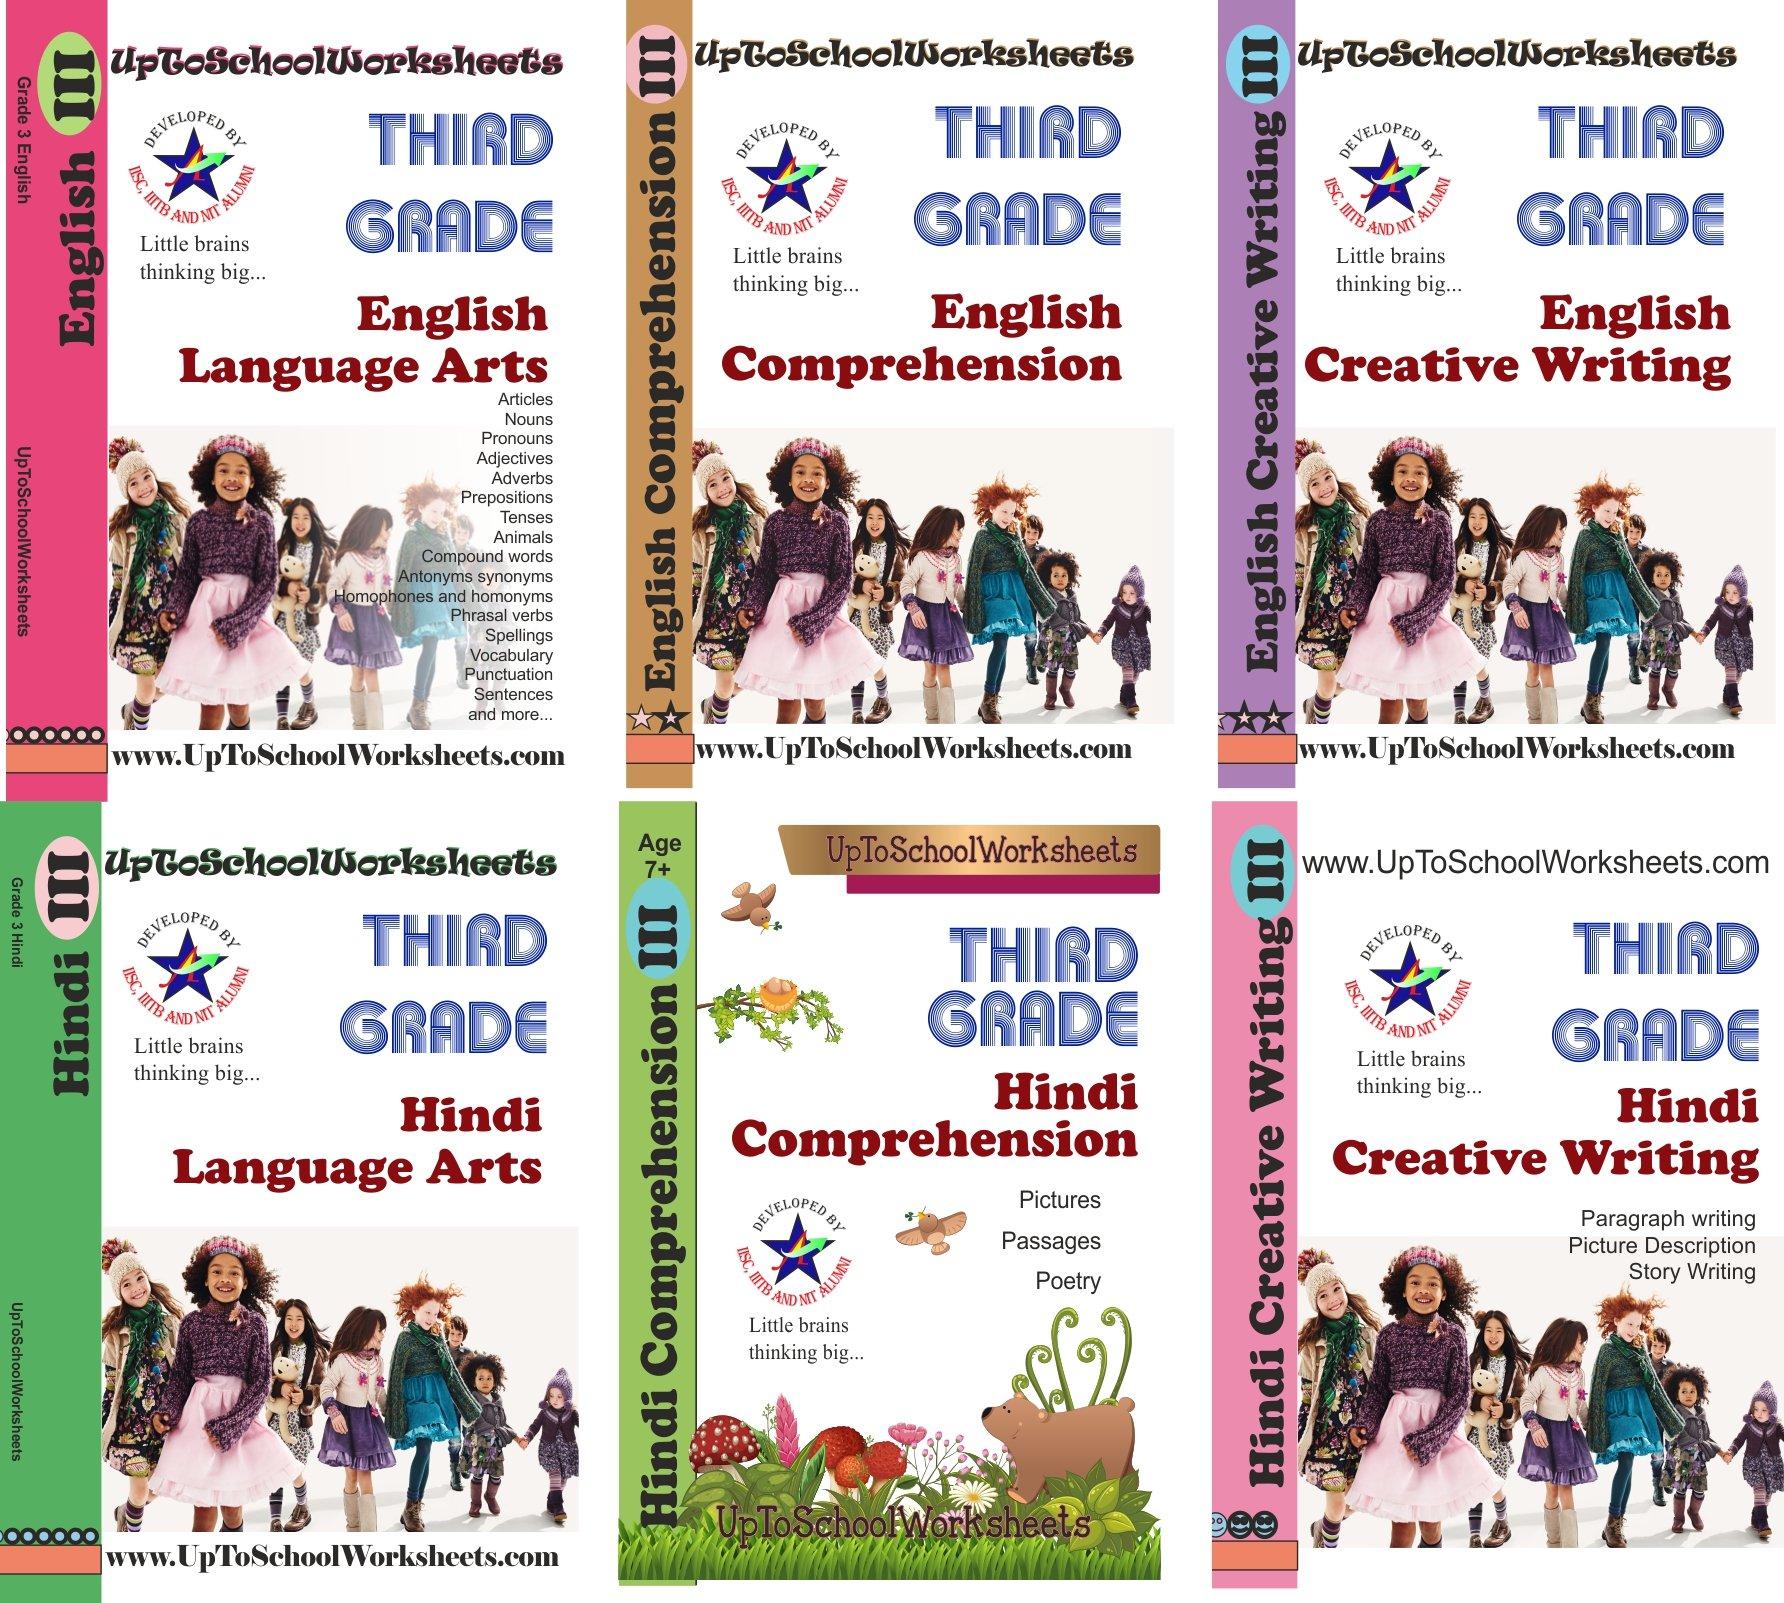 creative writing in hindi for class 3